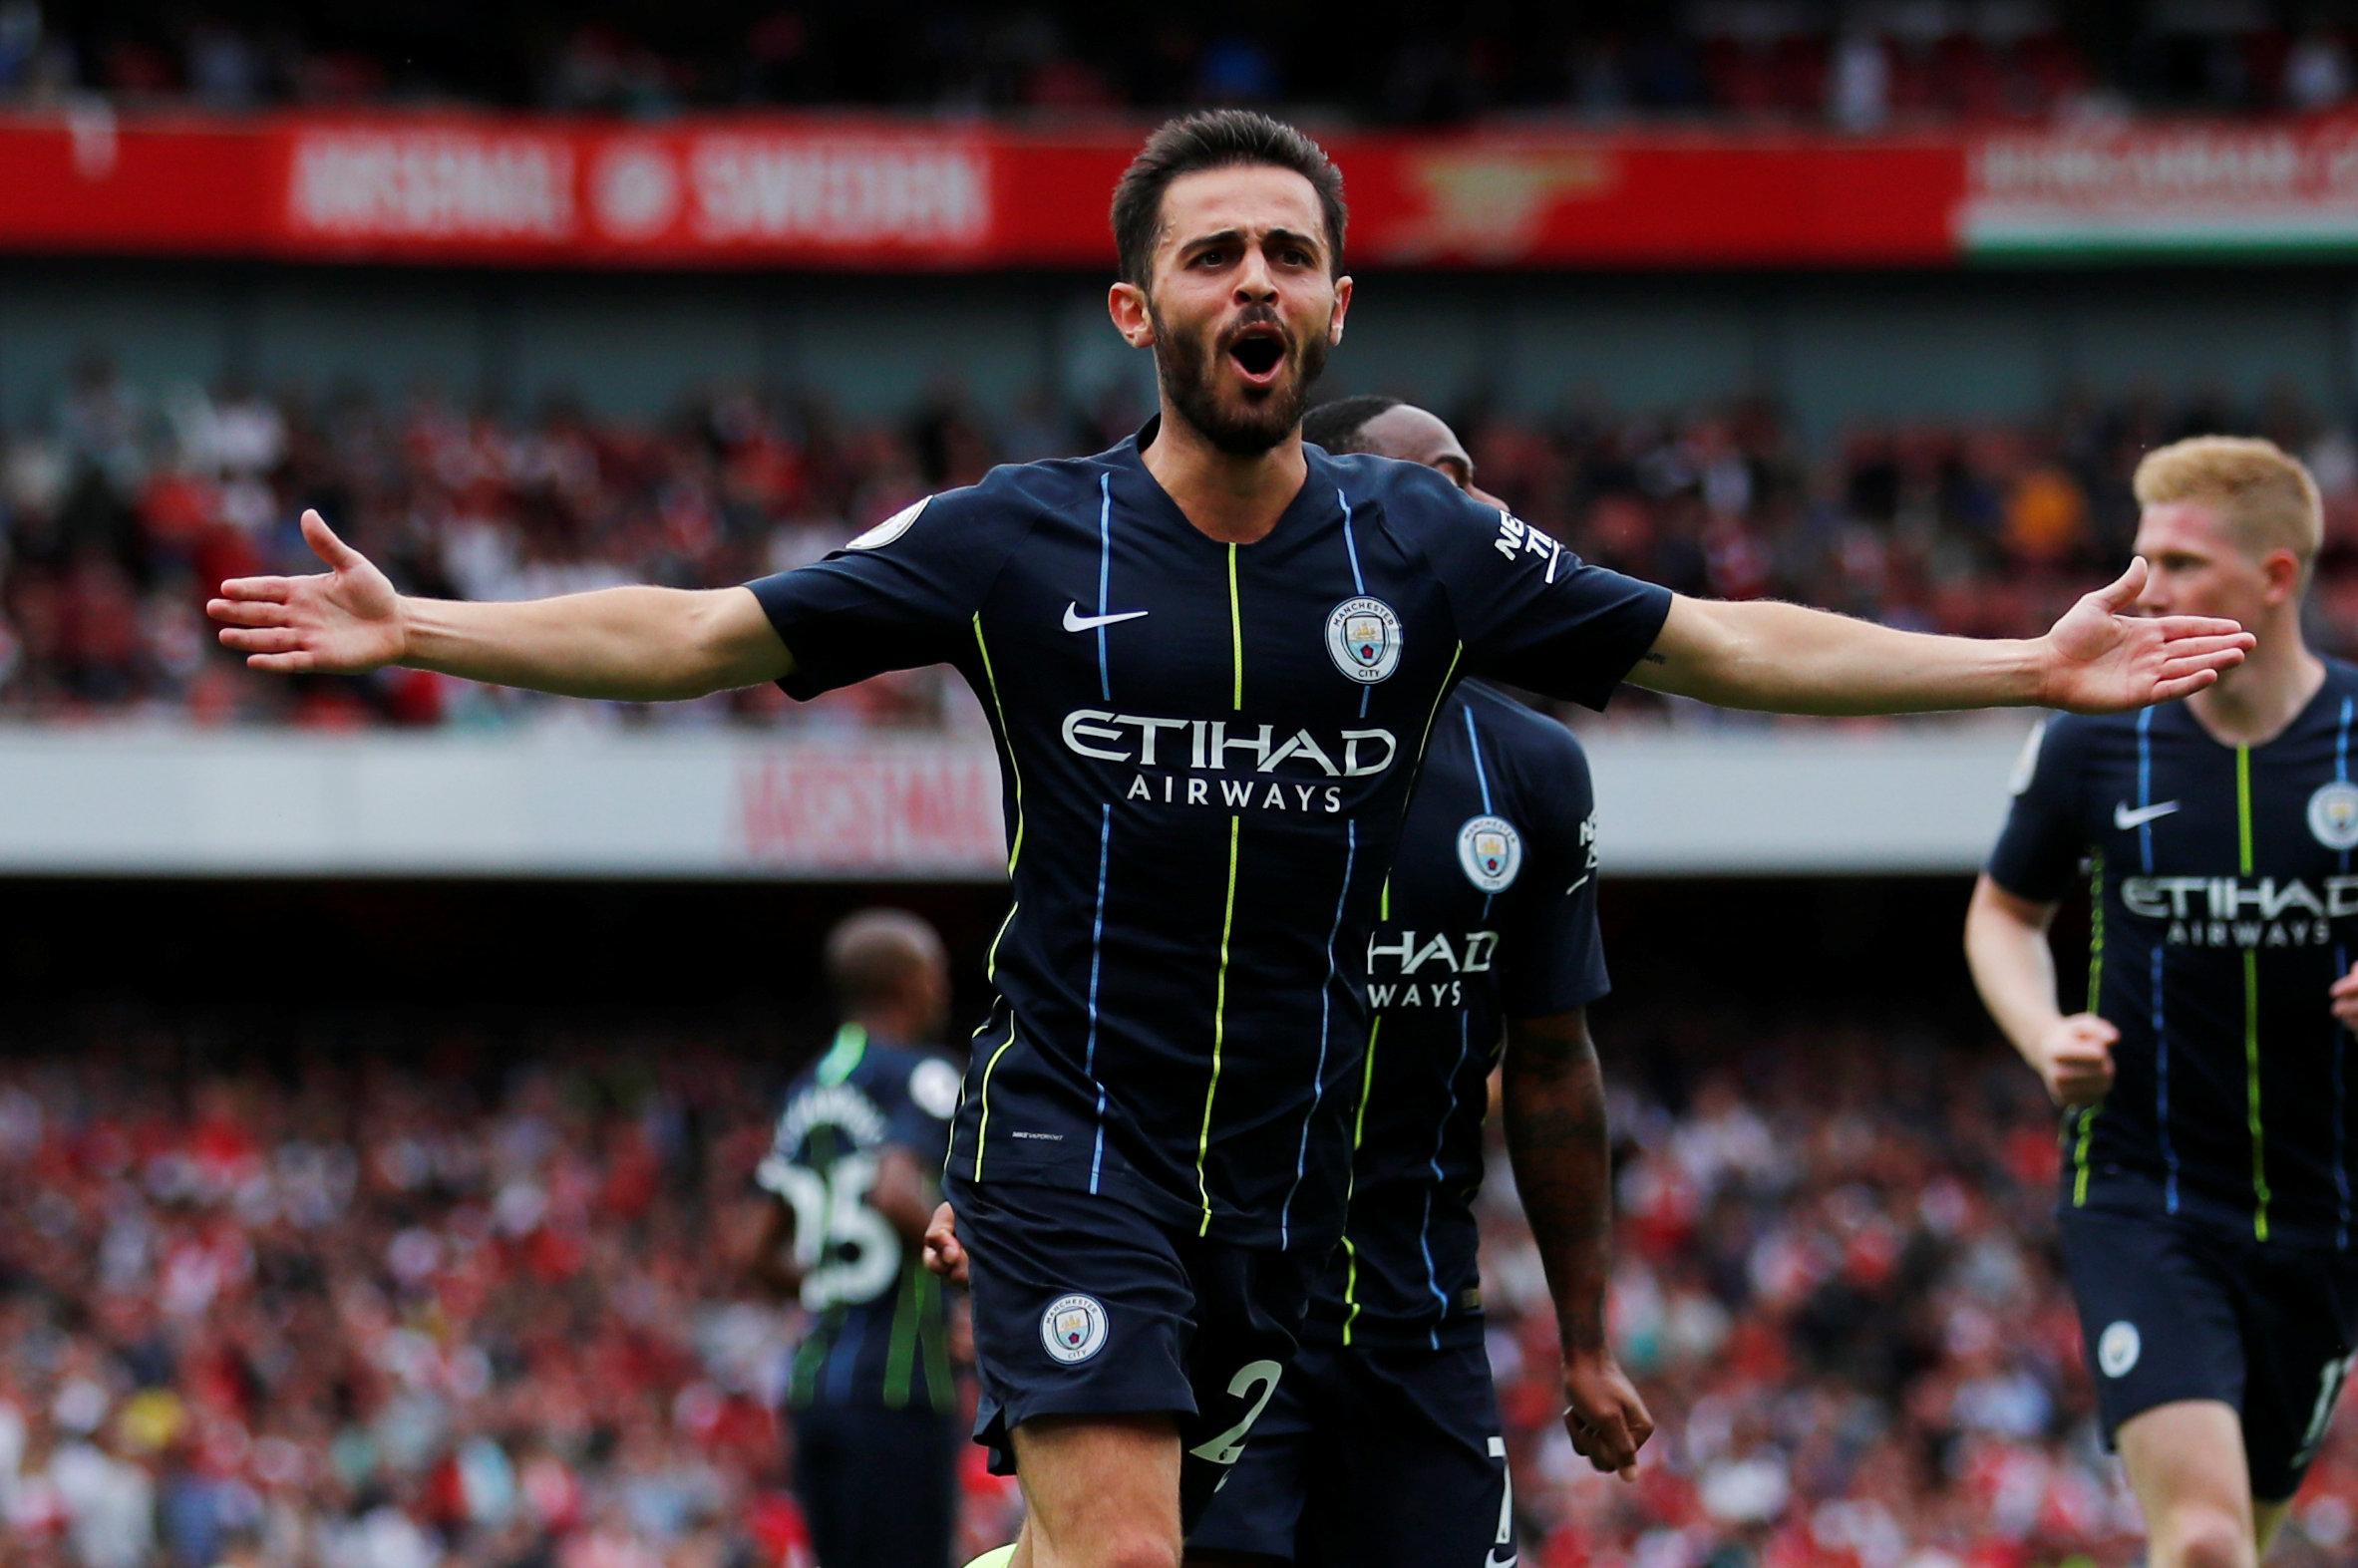 Football: Champions City are impressive winners at Arsenal